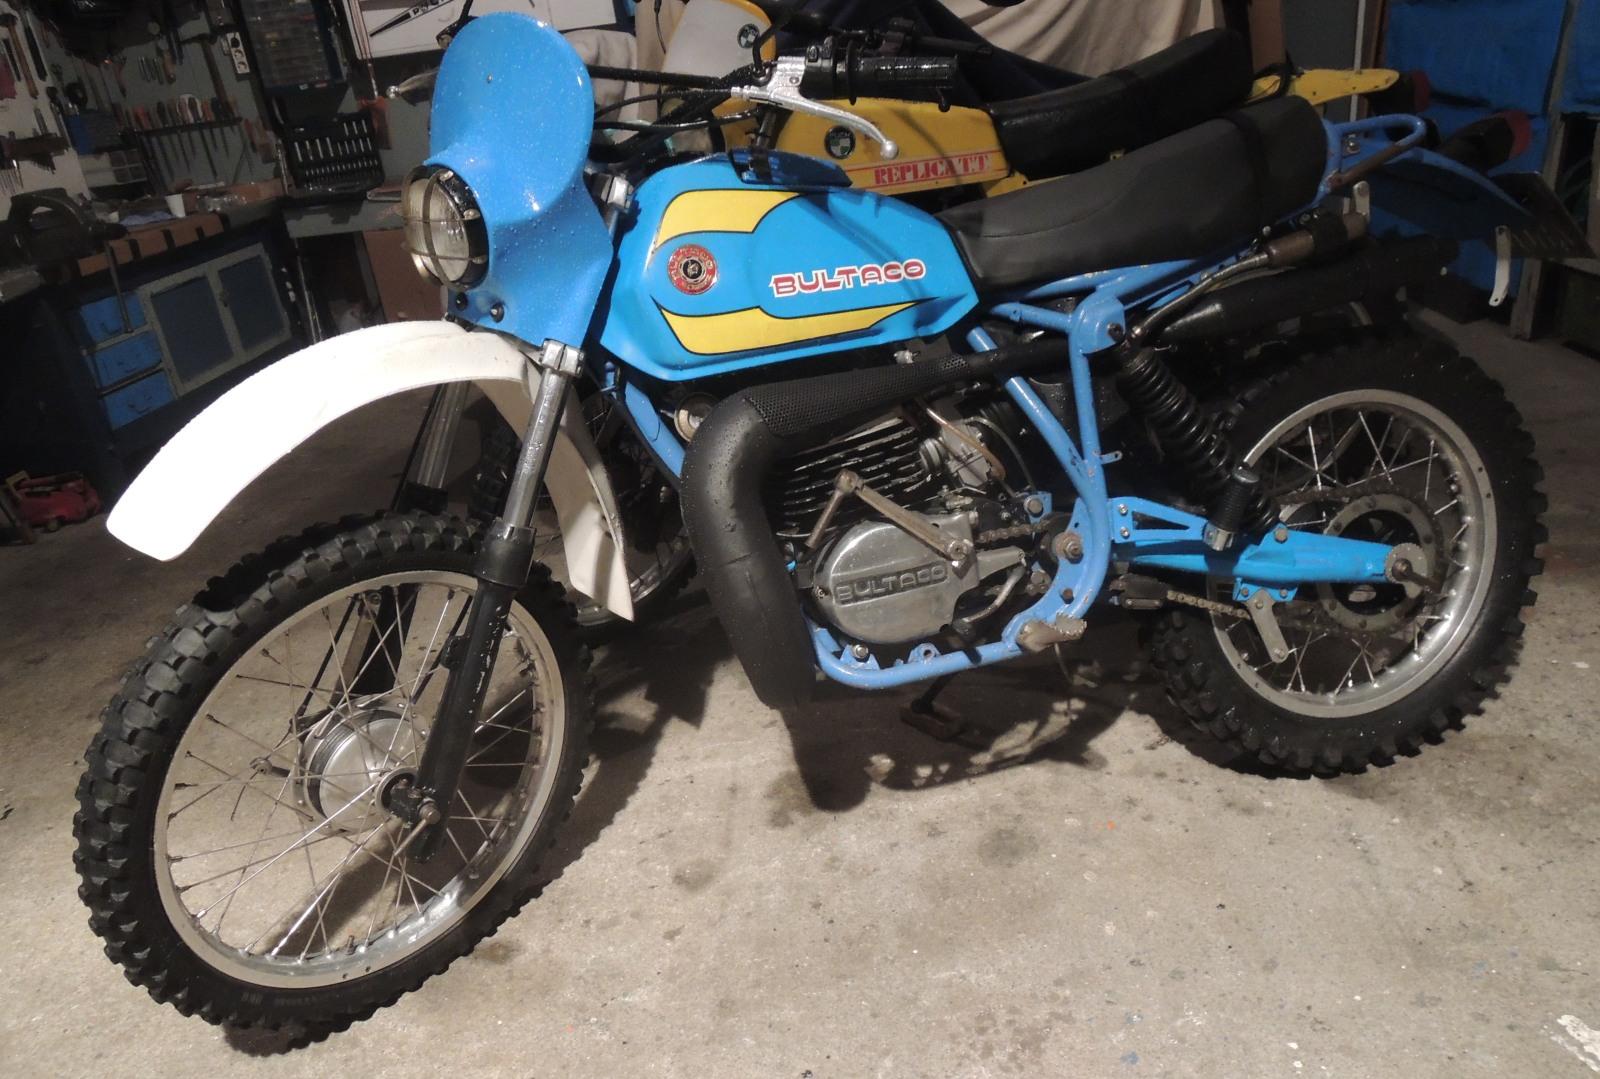 Bultaco Frontera MK11 370 - By Jorok - Página 2 I5pv2b